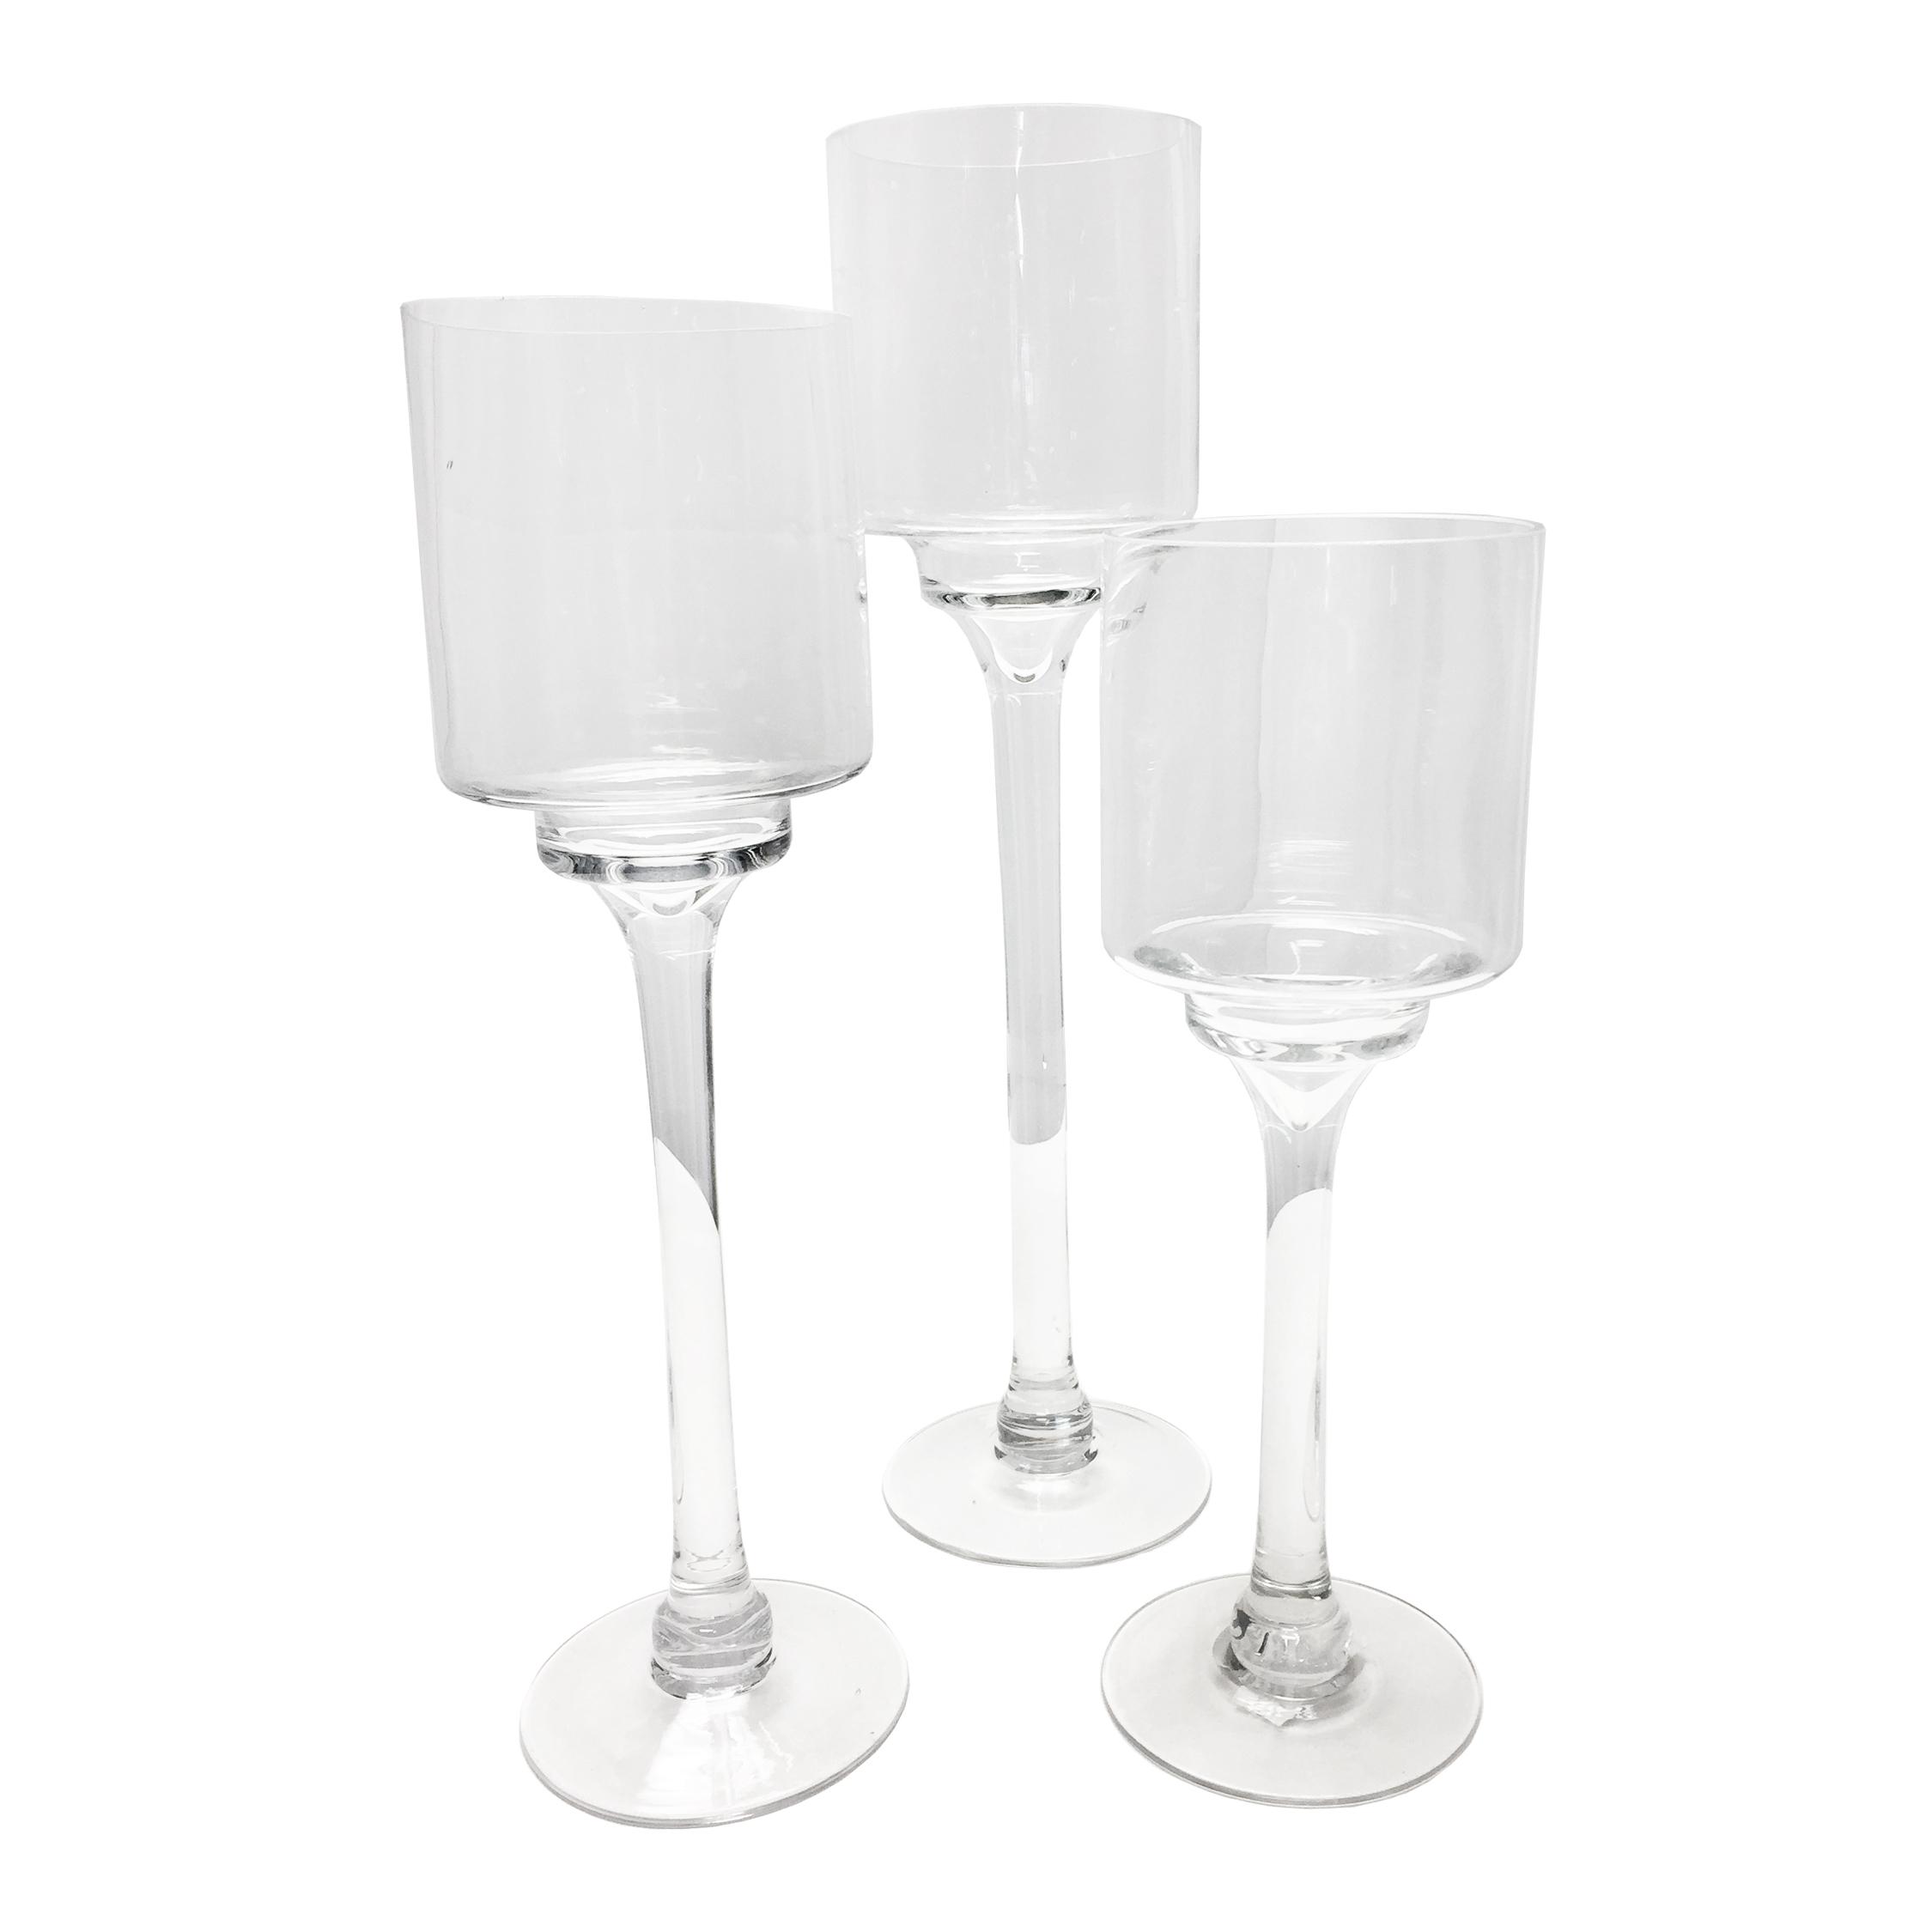 Glass Pedestal Candleholders, Set of 3 Glass Long-stem Candle Holders Rental